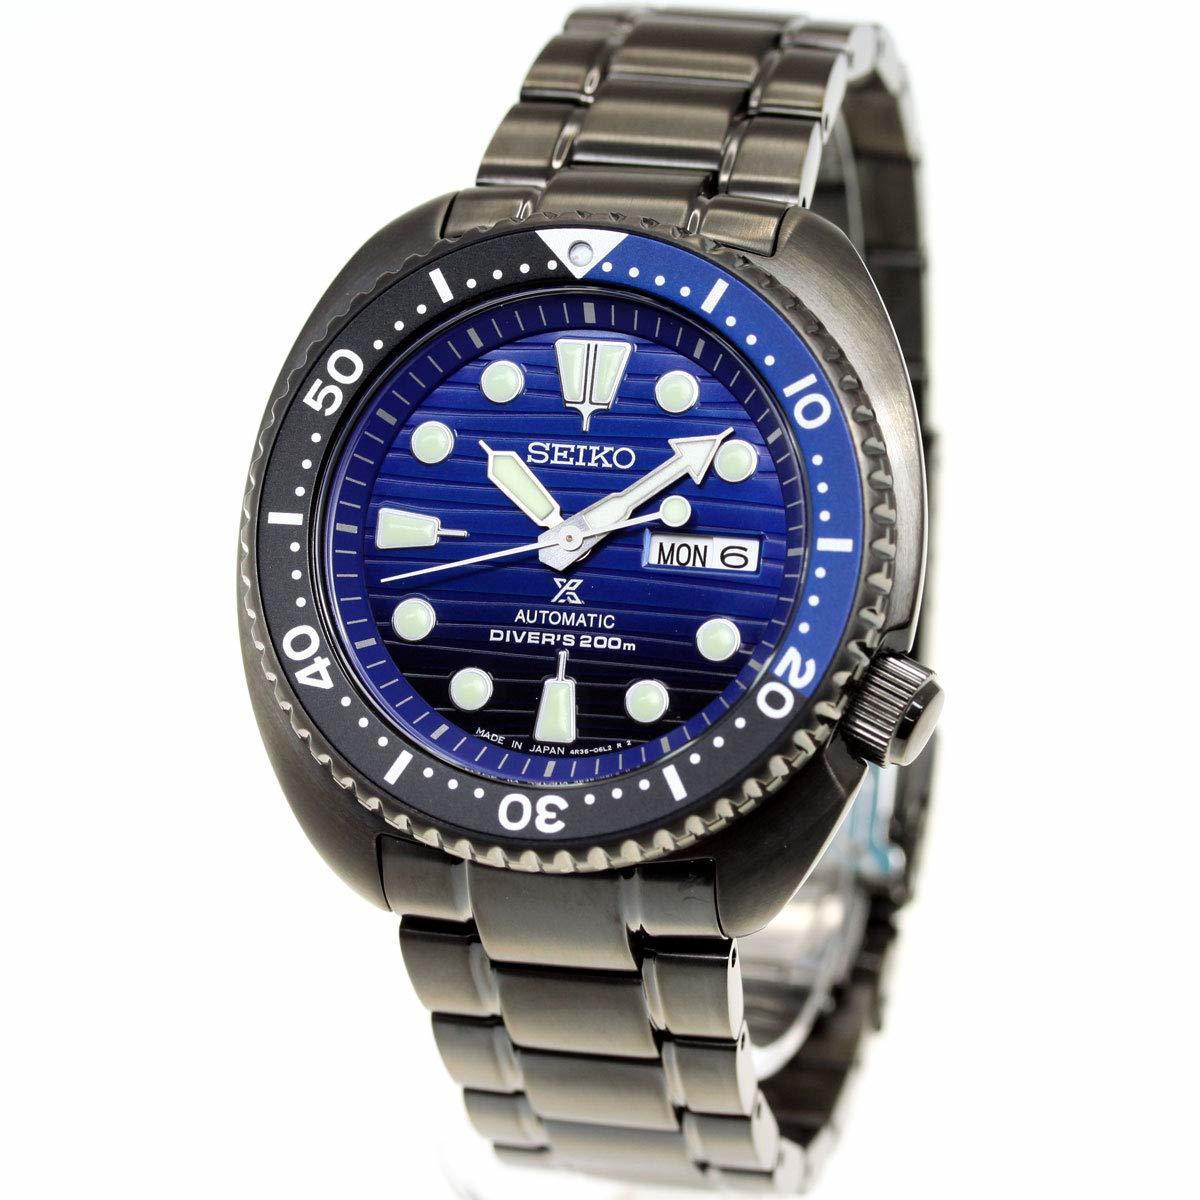 Мужские часы Seiko SRPD11 Prospex Turtle Diver's Automatic